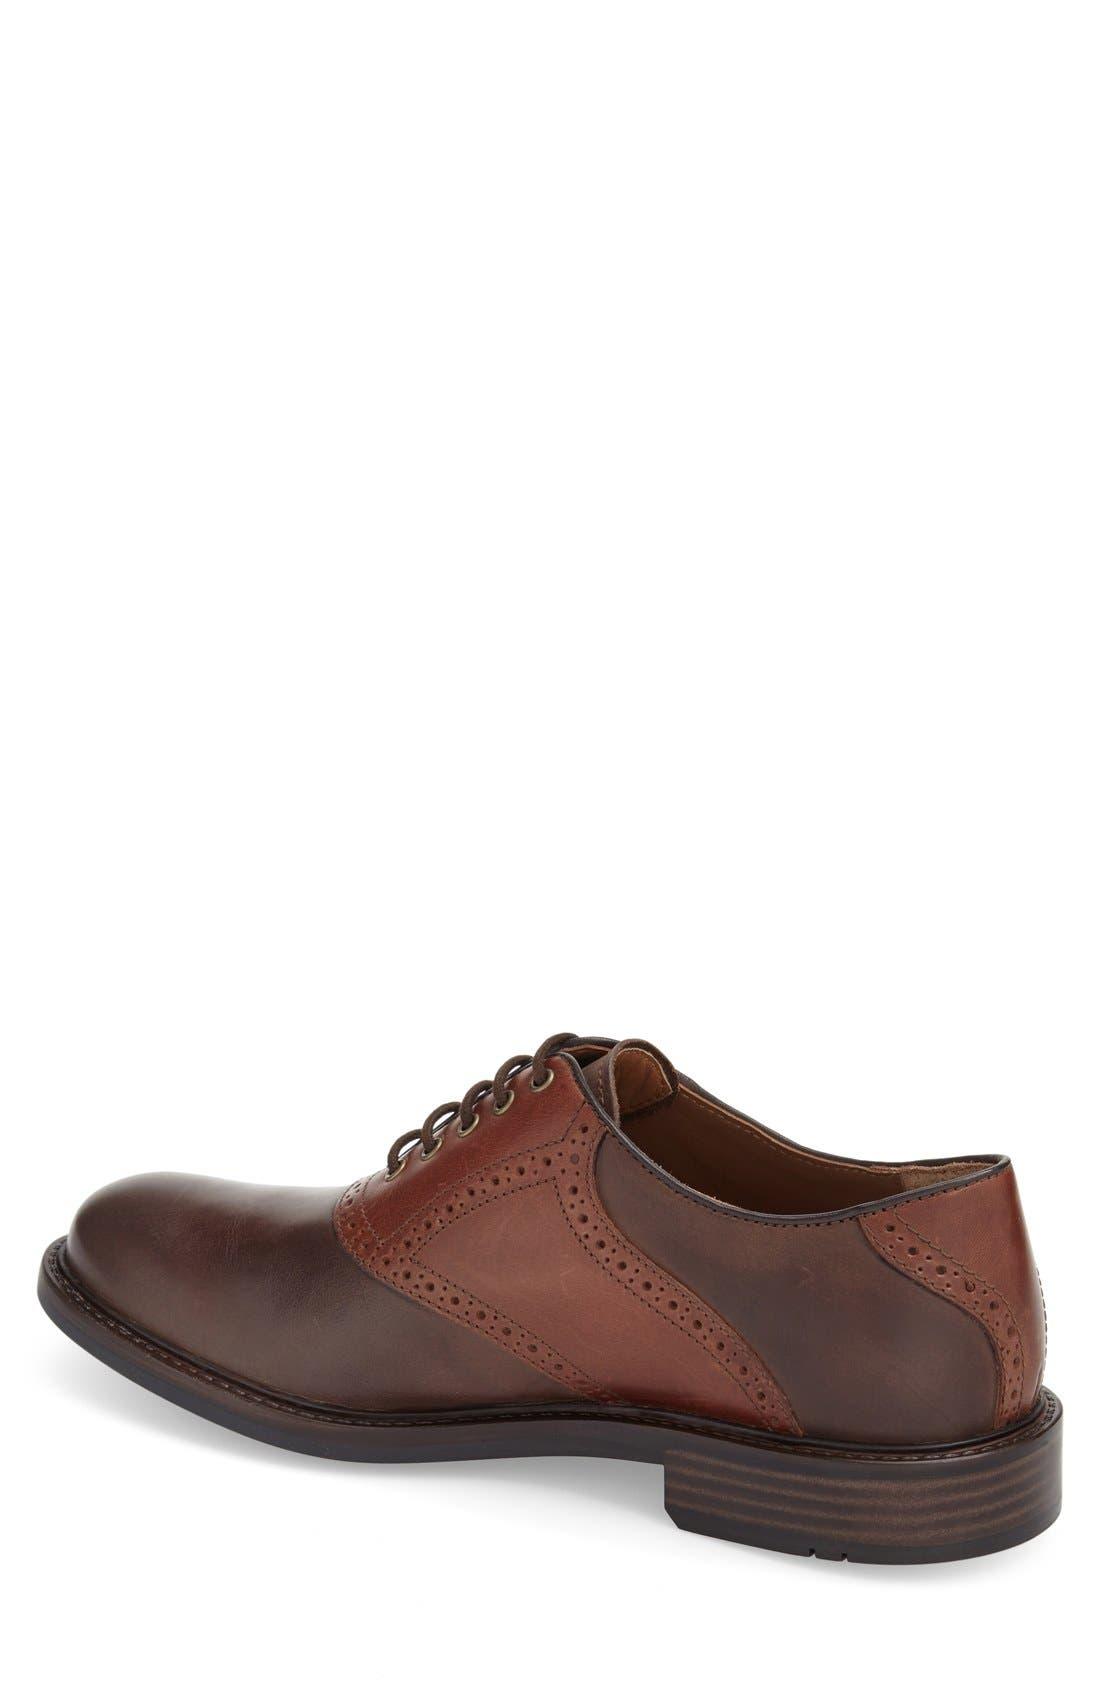 'Tabor' Saddle Shoe,                             Alternate thumbnail 2, color,                             200